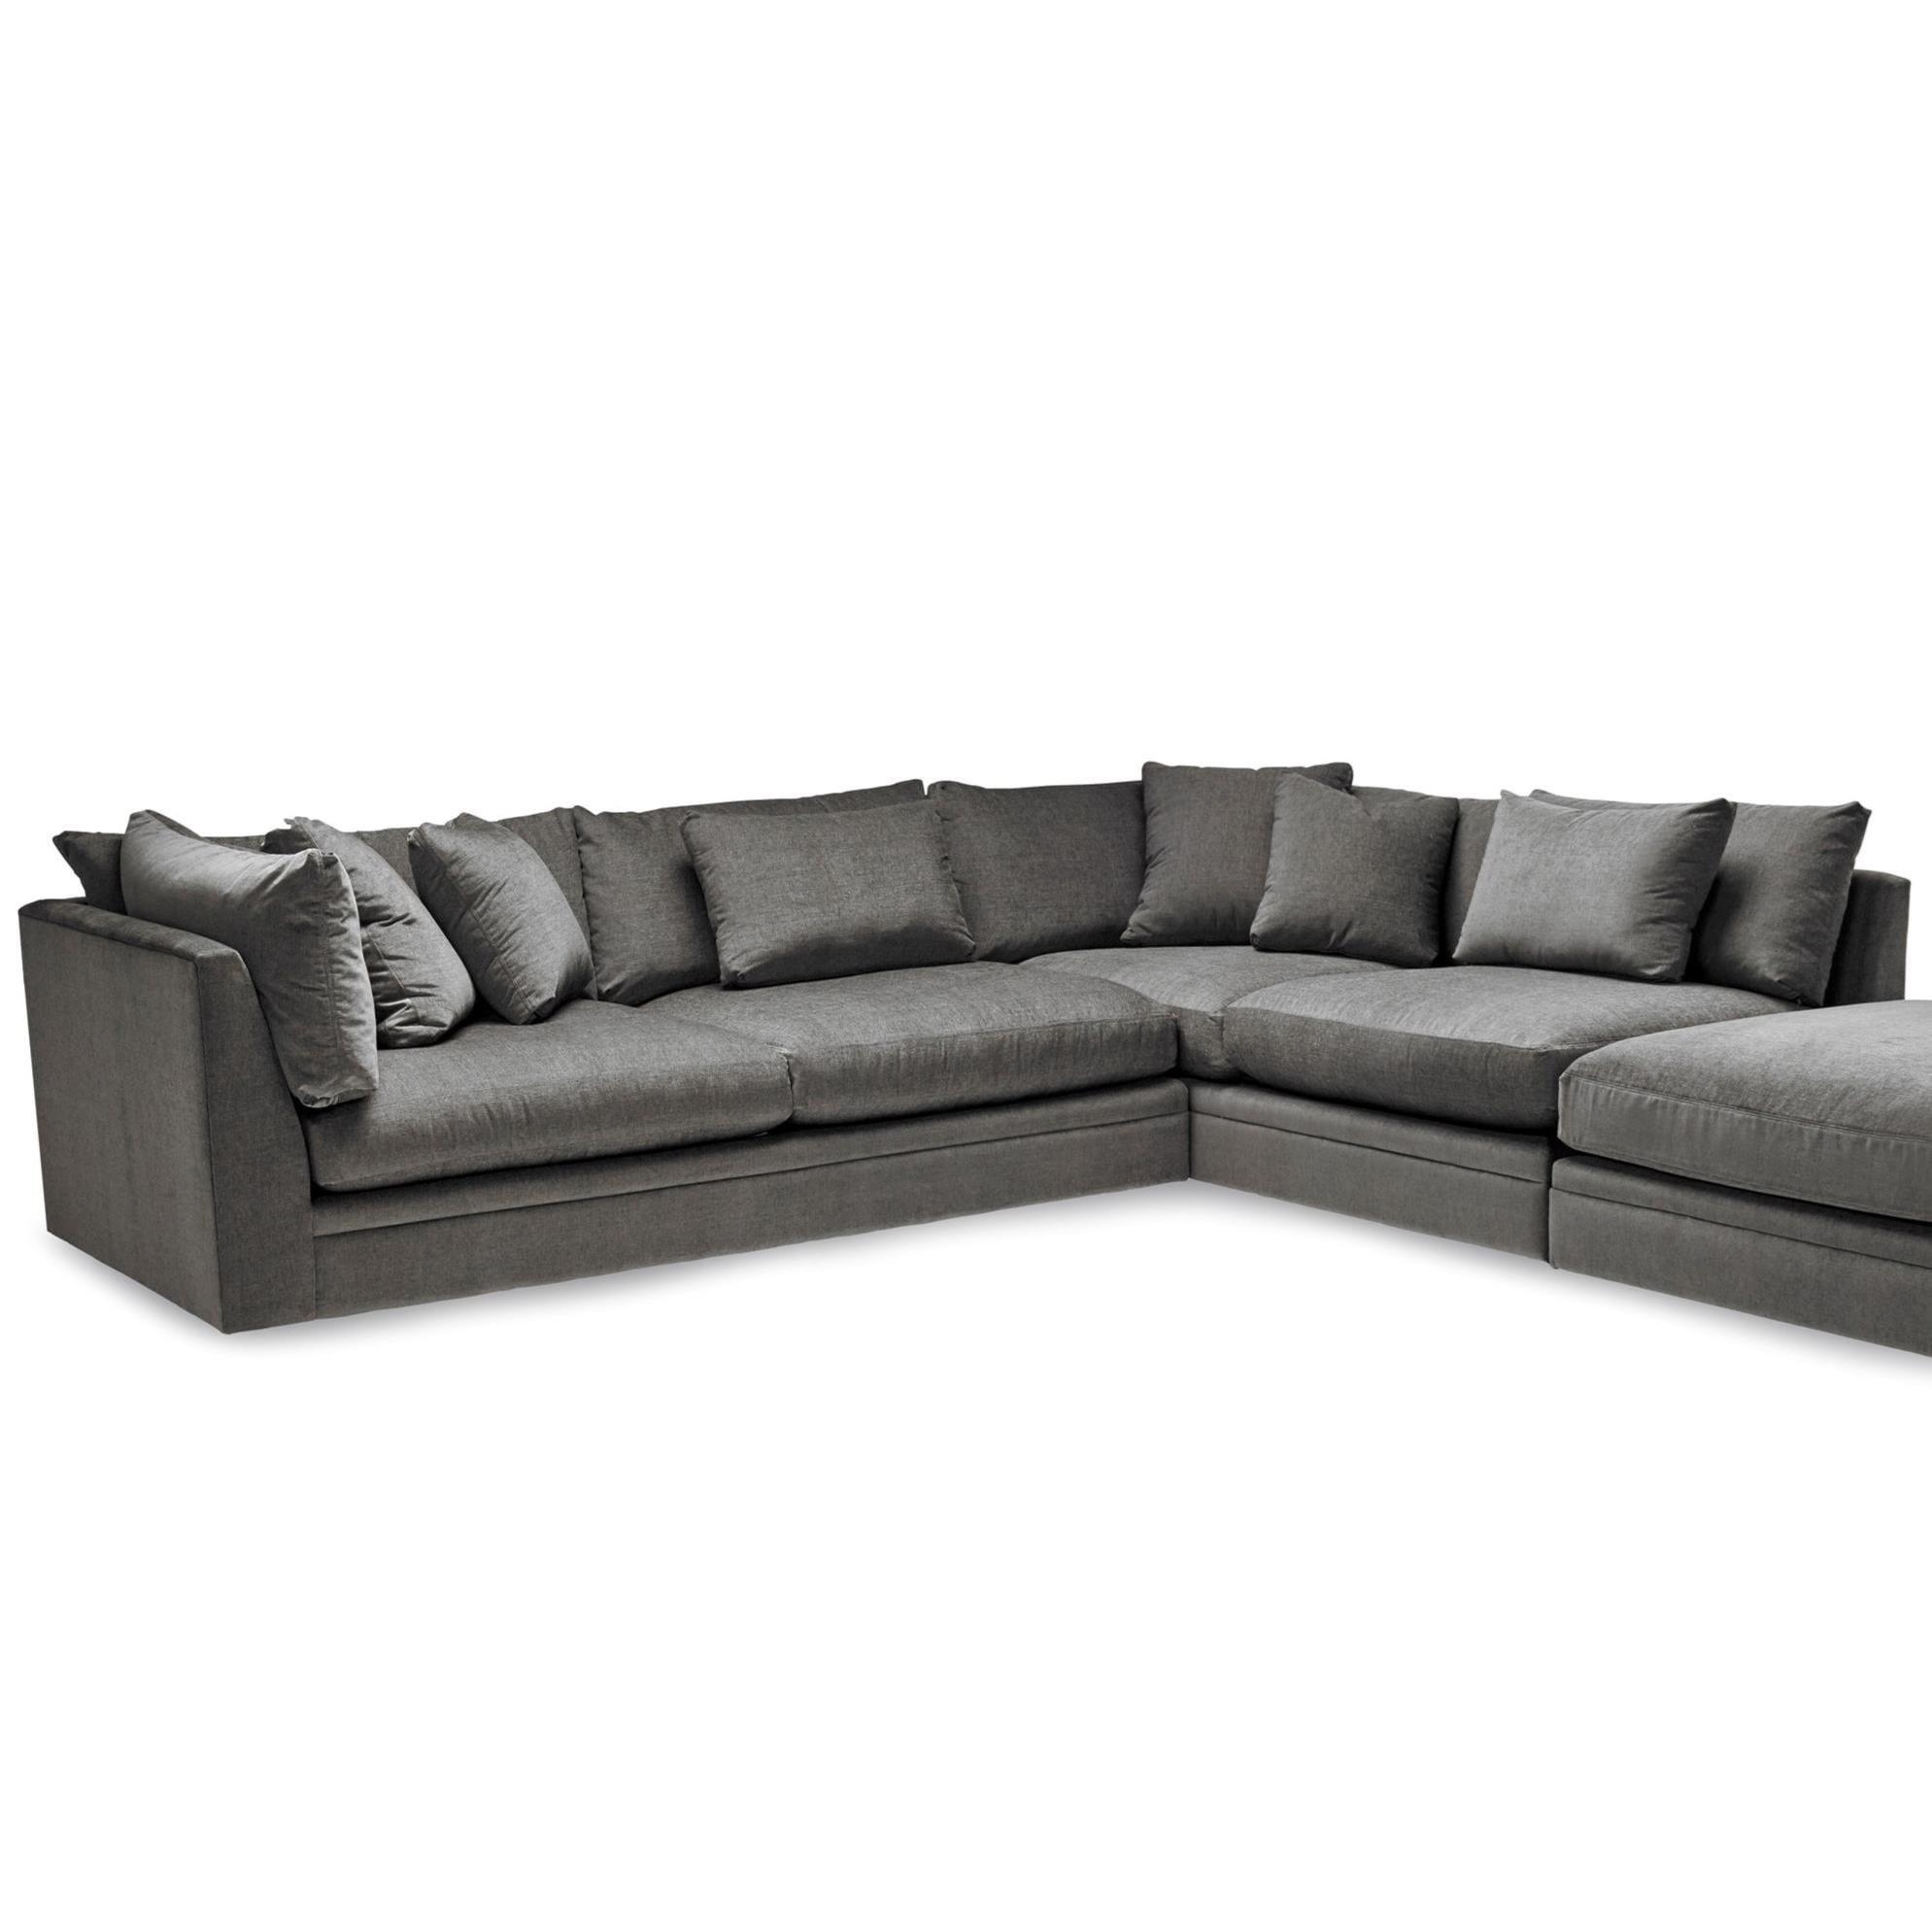 Stylus 1414 2 Pc Sectional Sofa